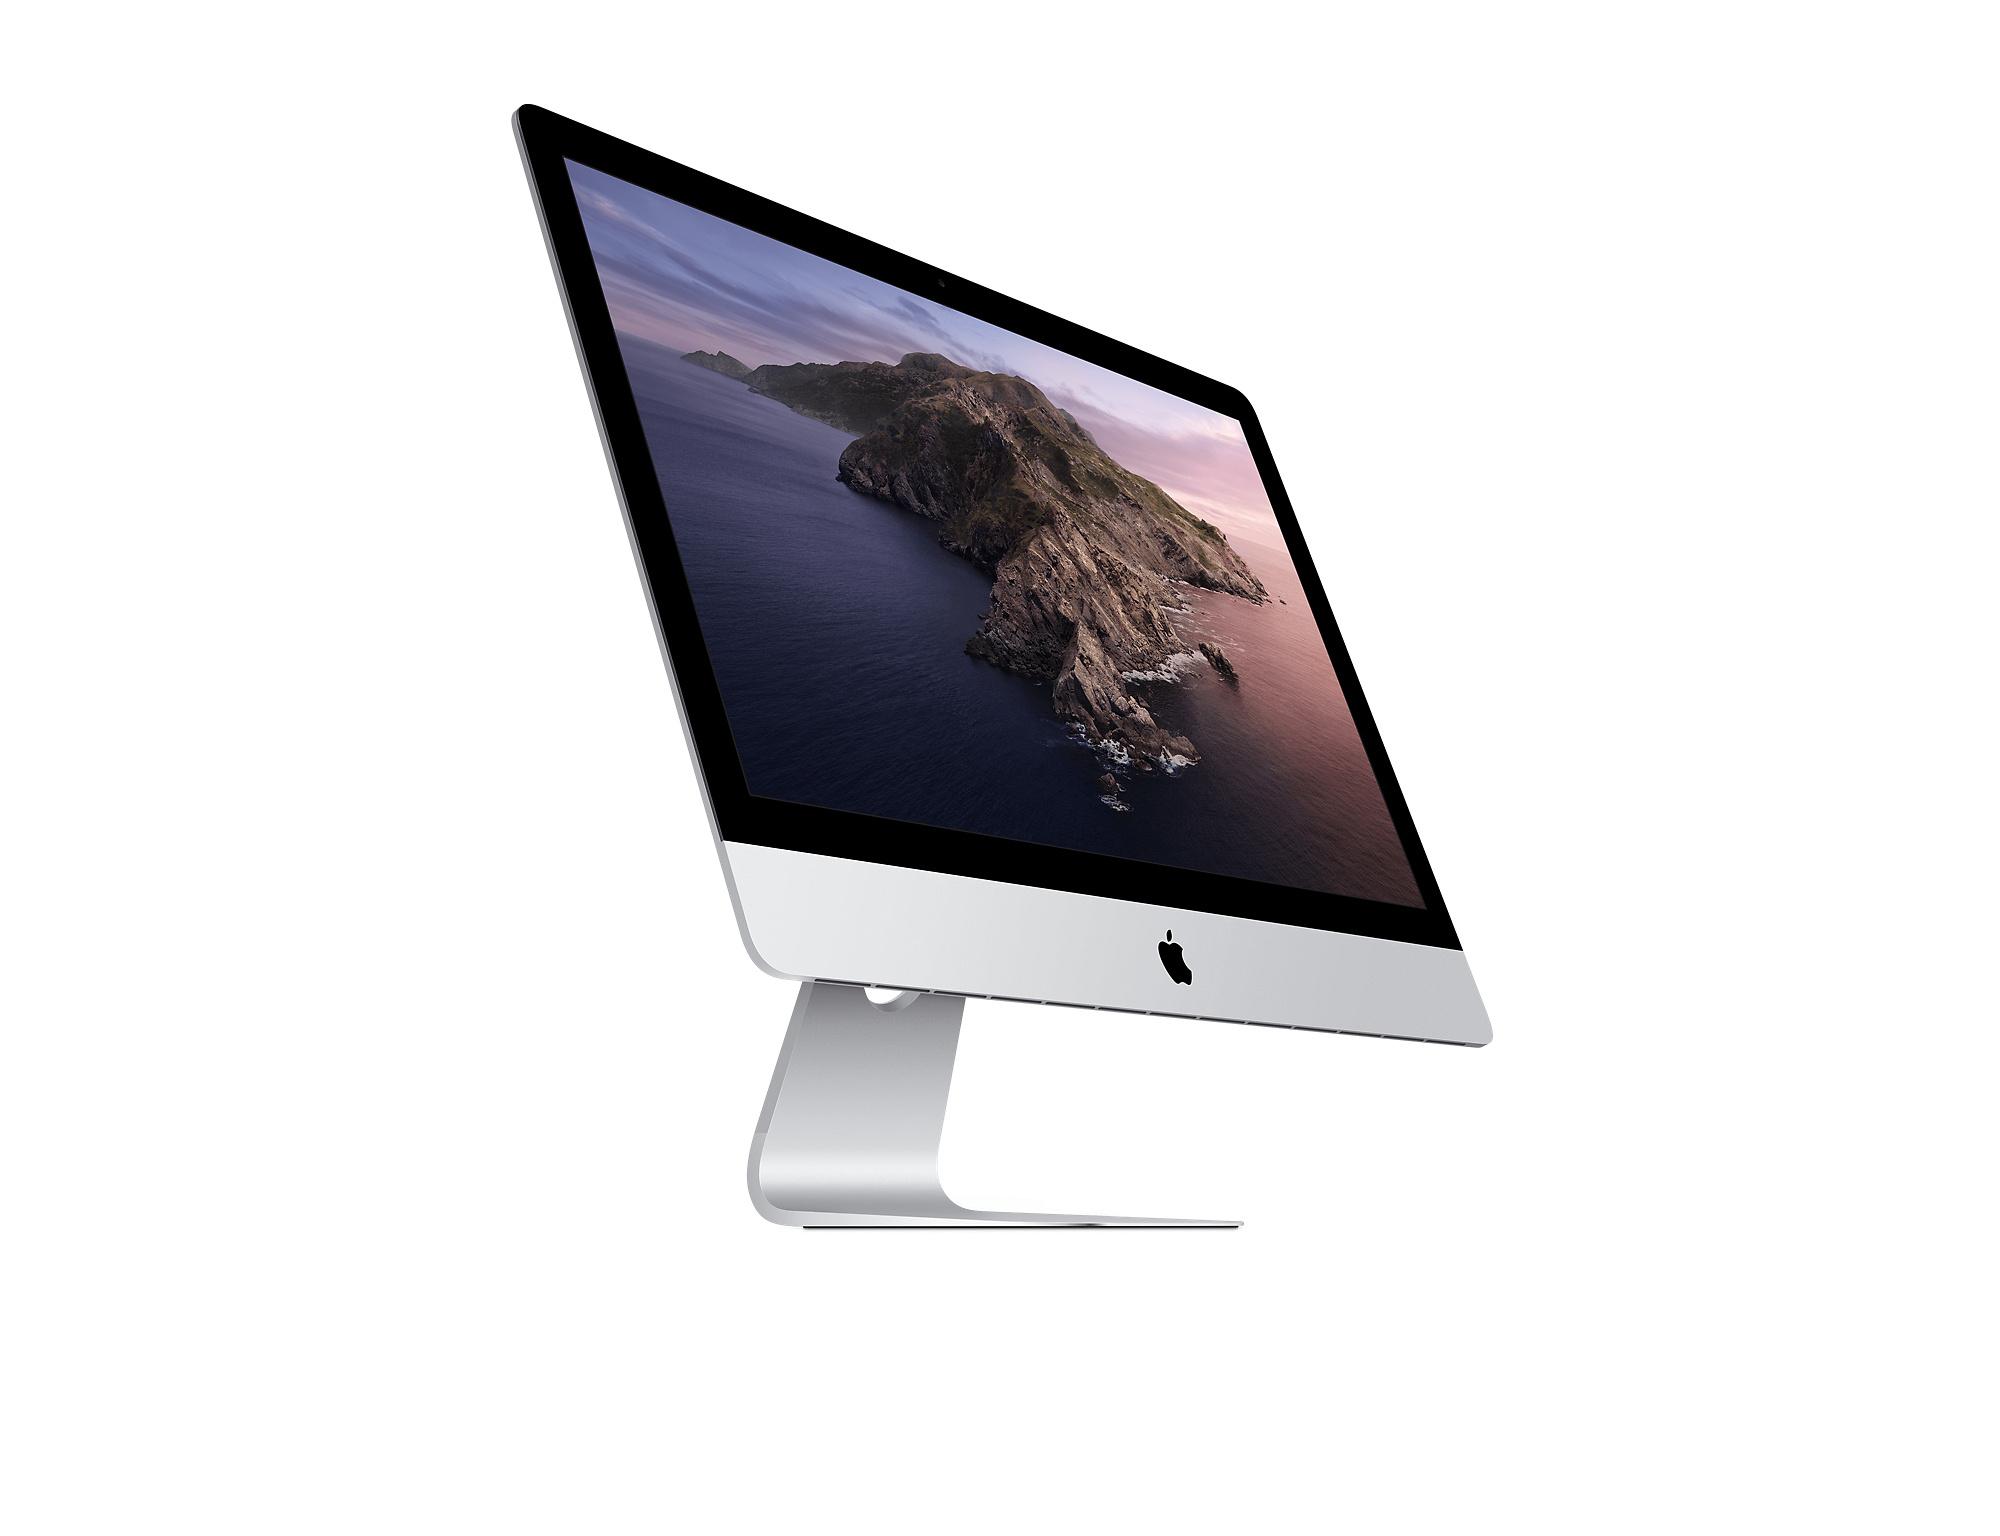 Apple iMac mit Retina 5K Display - All-in-One (Komplettlösung)